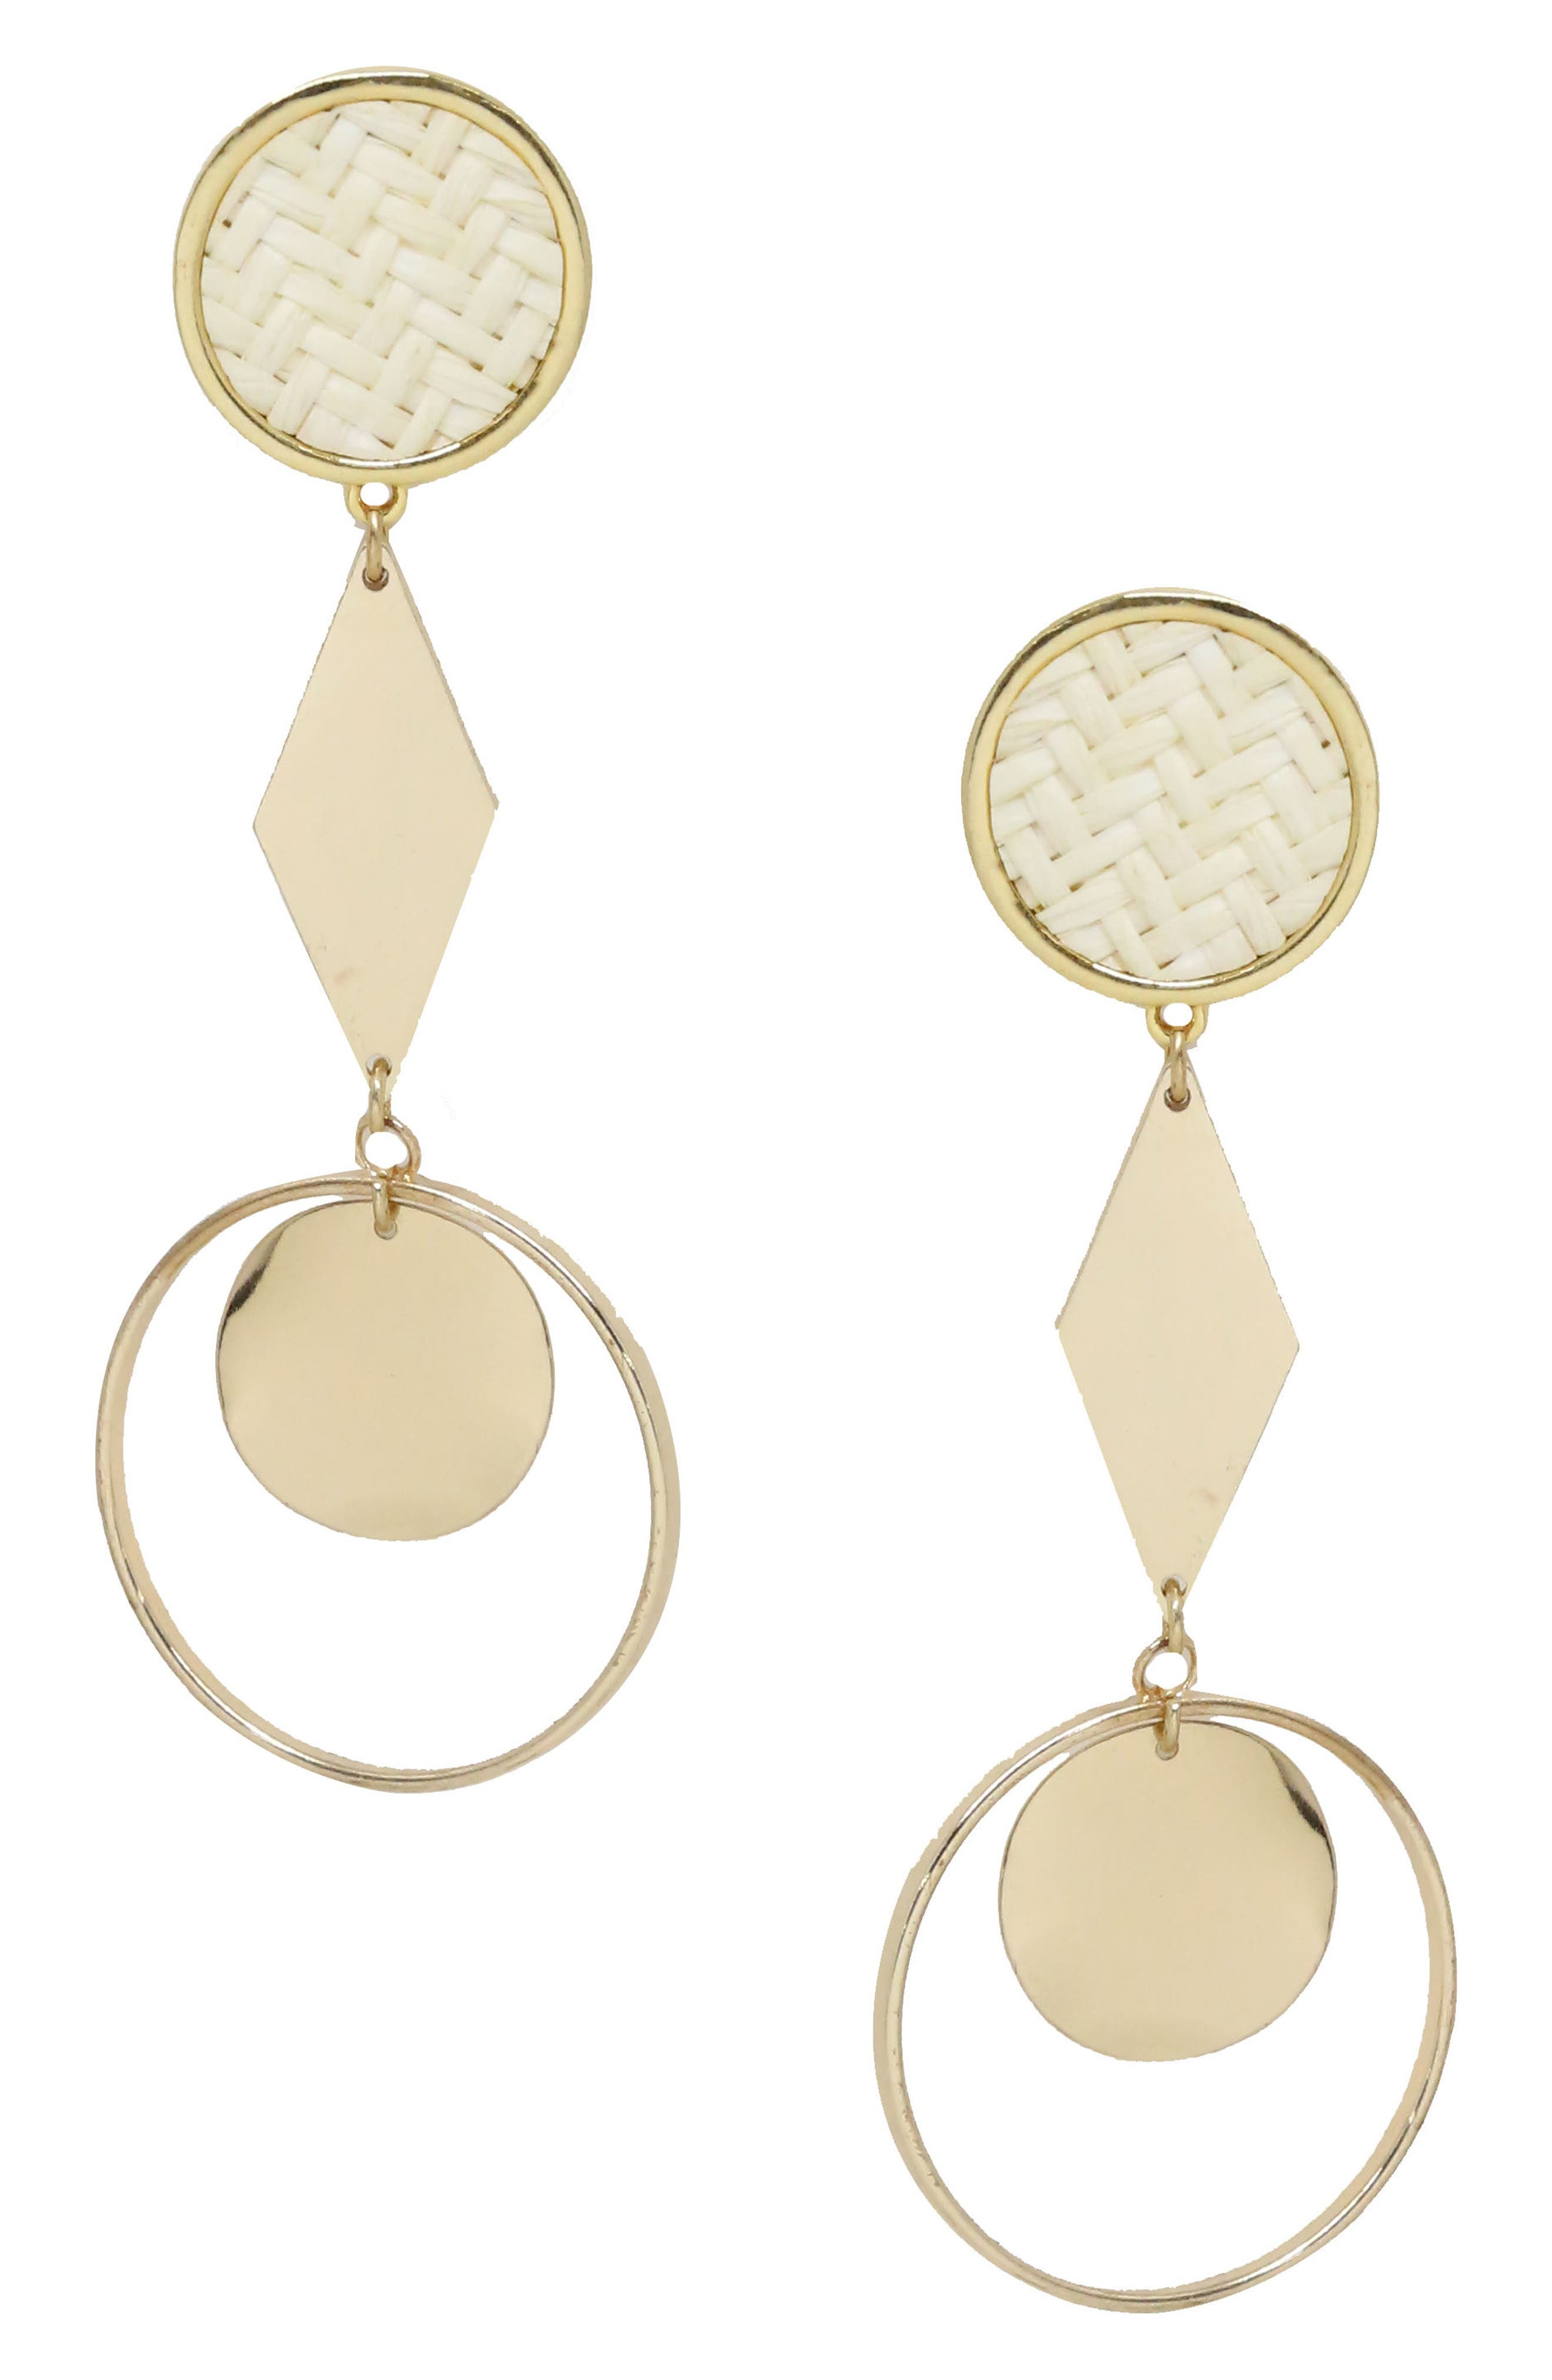 Geo Earrings,                         Main,                         color, Gold/ Cream